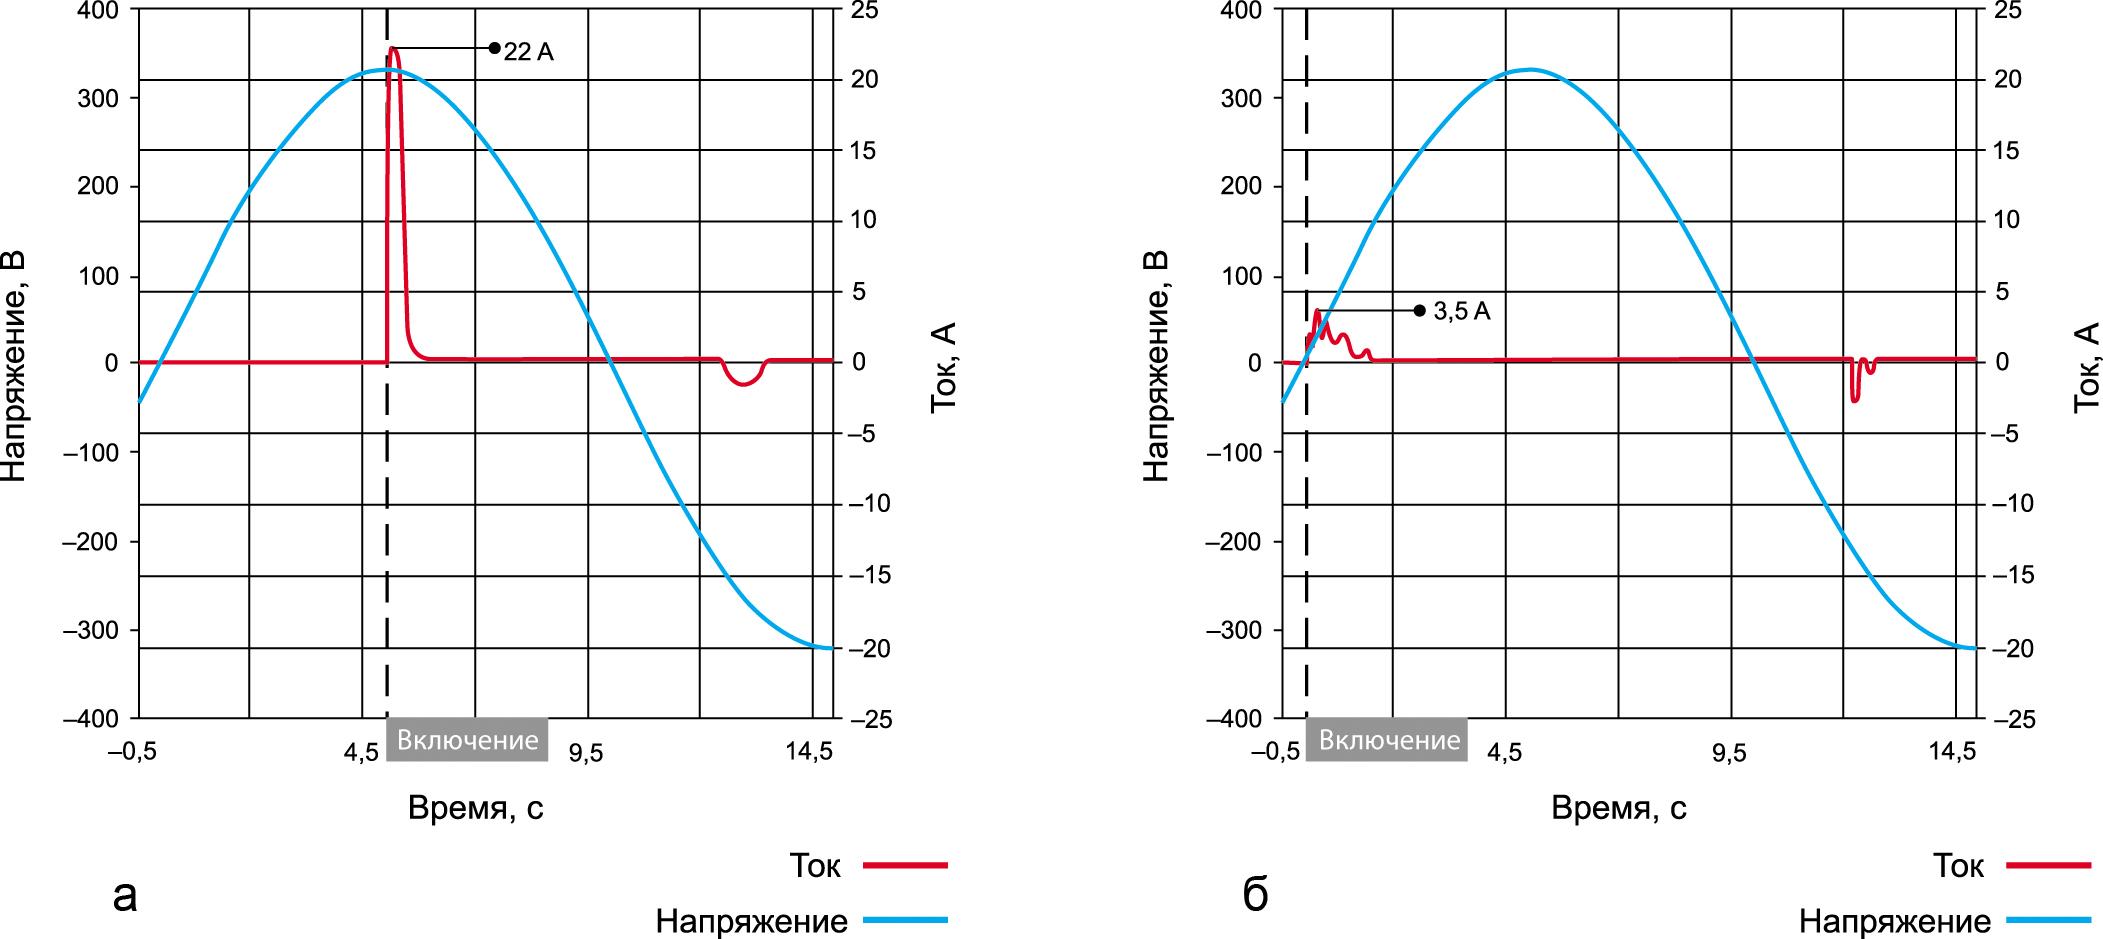 Изменение параметров импульса пускового тока в зависимости от момента включения